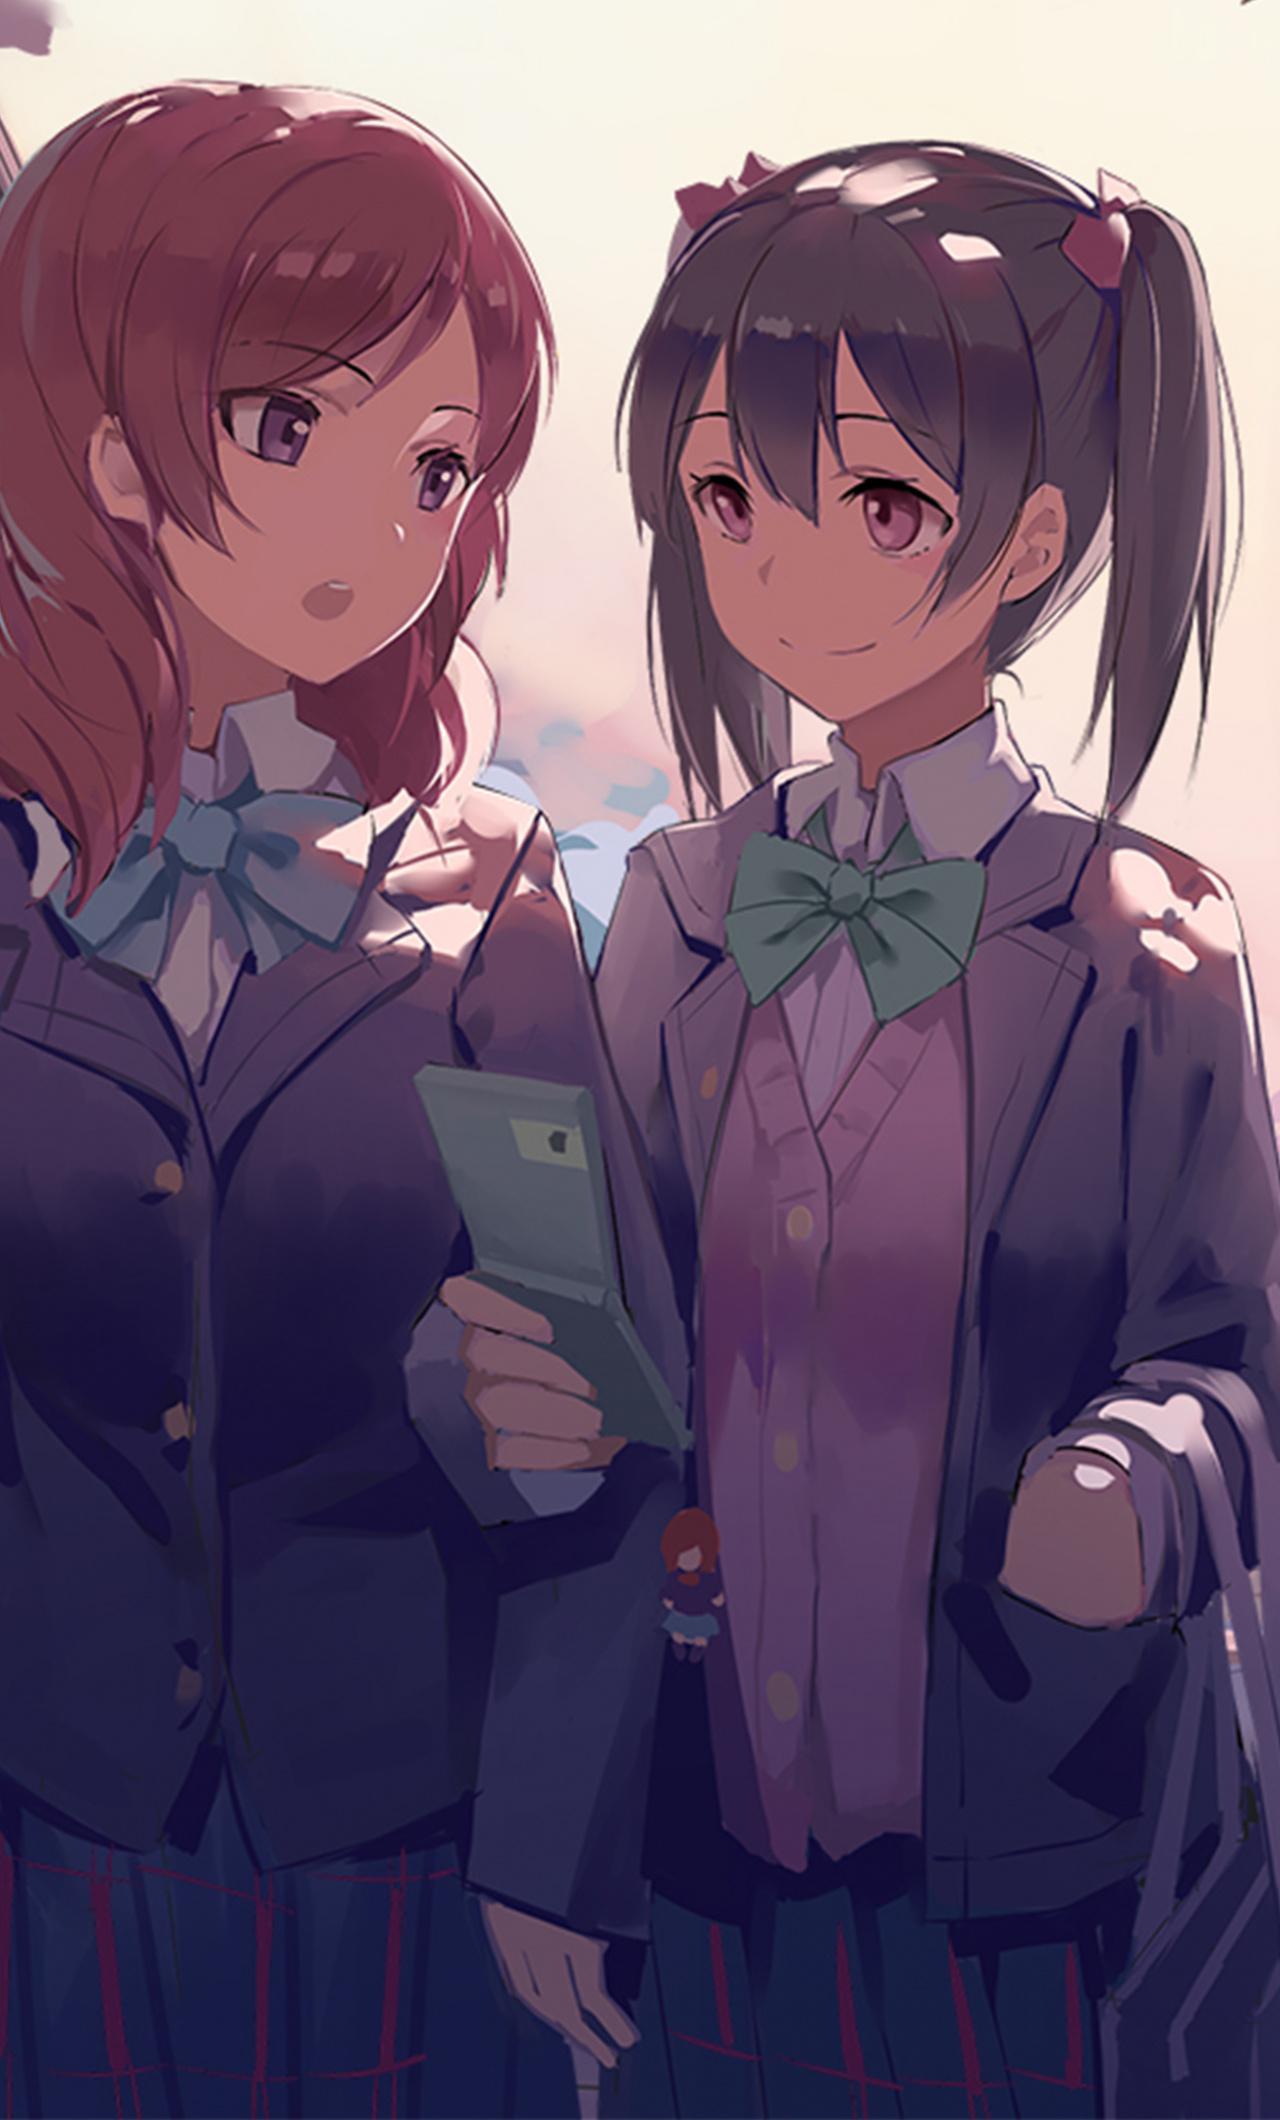 Wallpaper Anime Girls, Artwork, Maki Nishikino, Nico - Love Live - HD Wallpaper